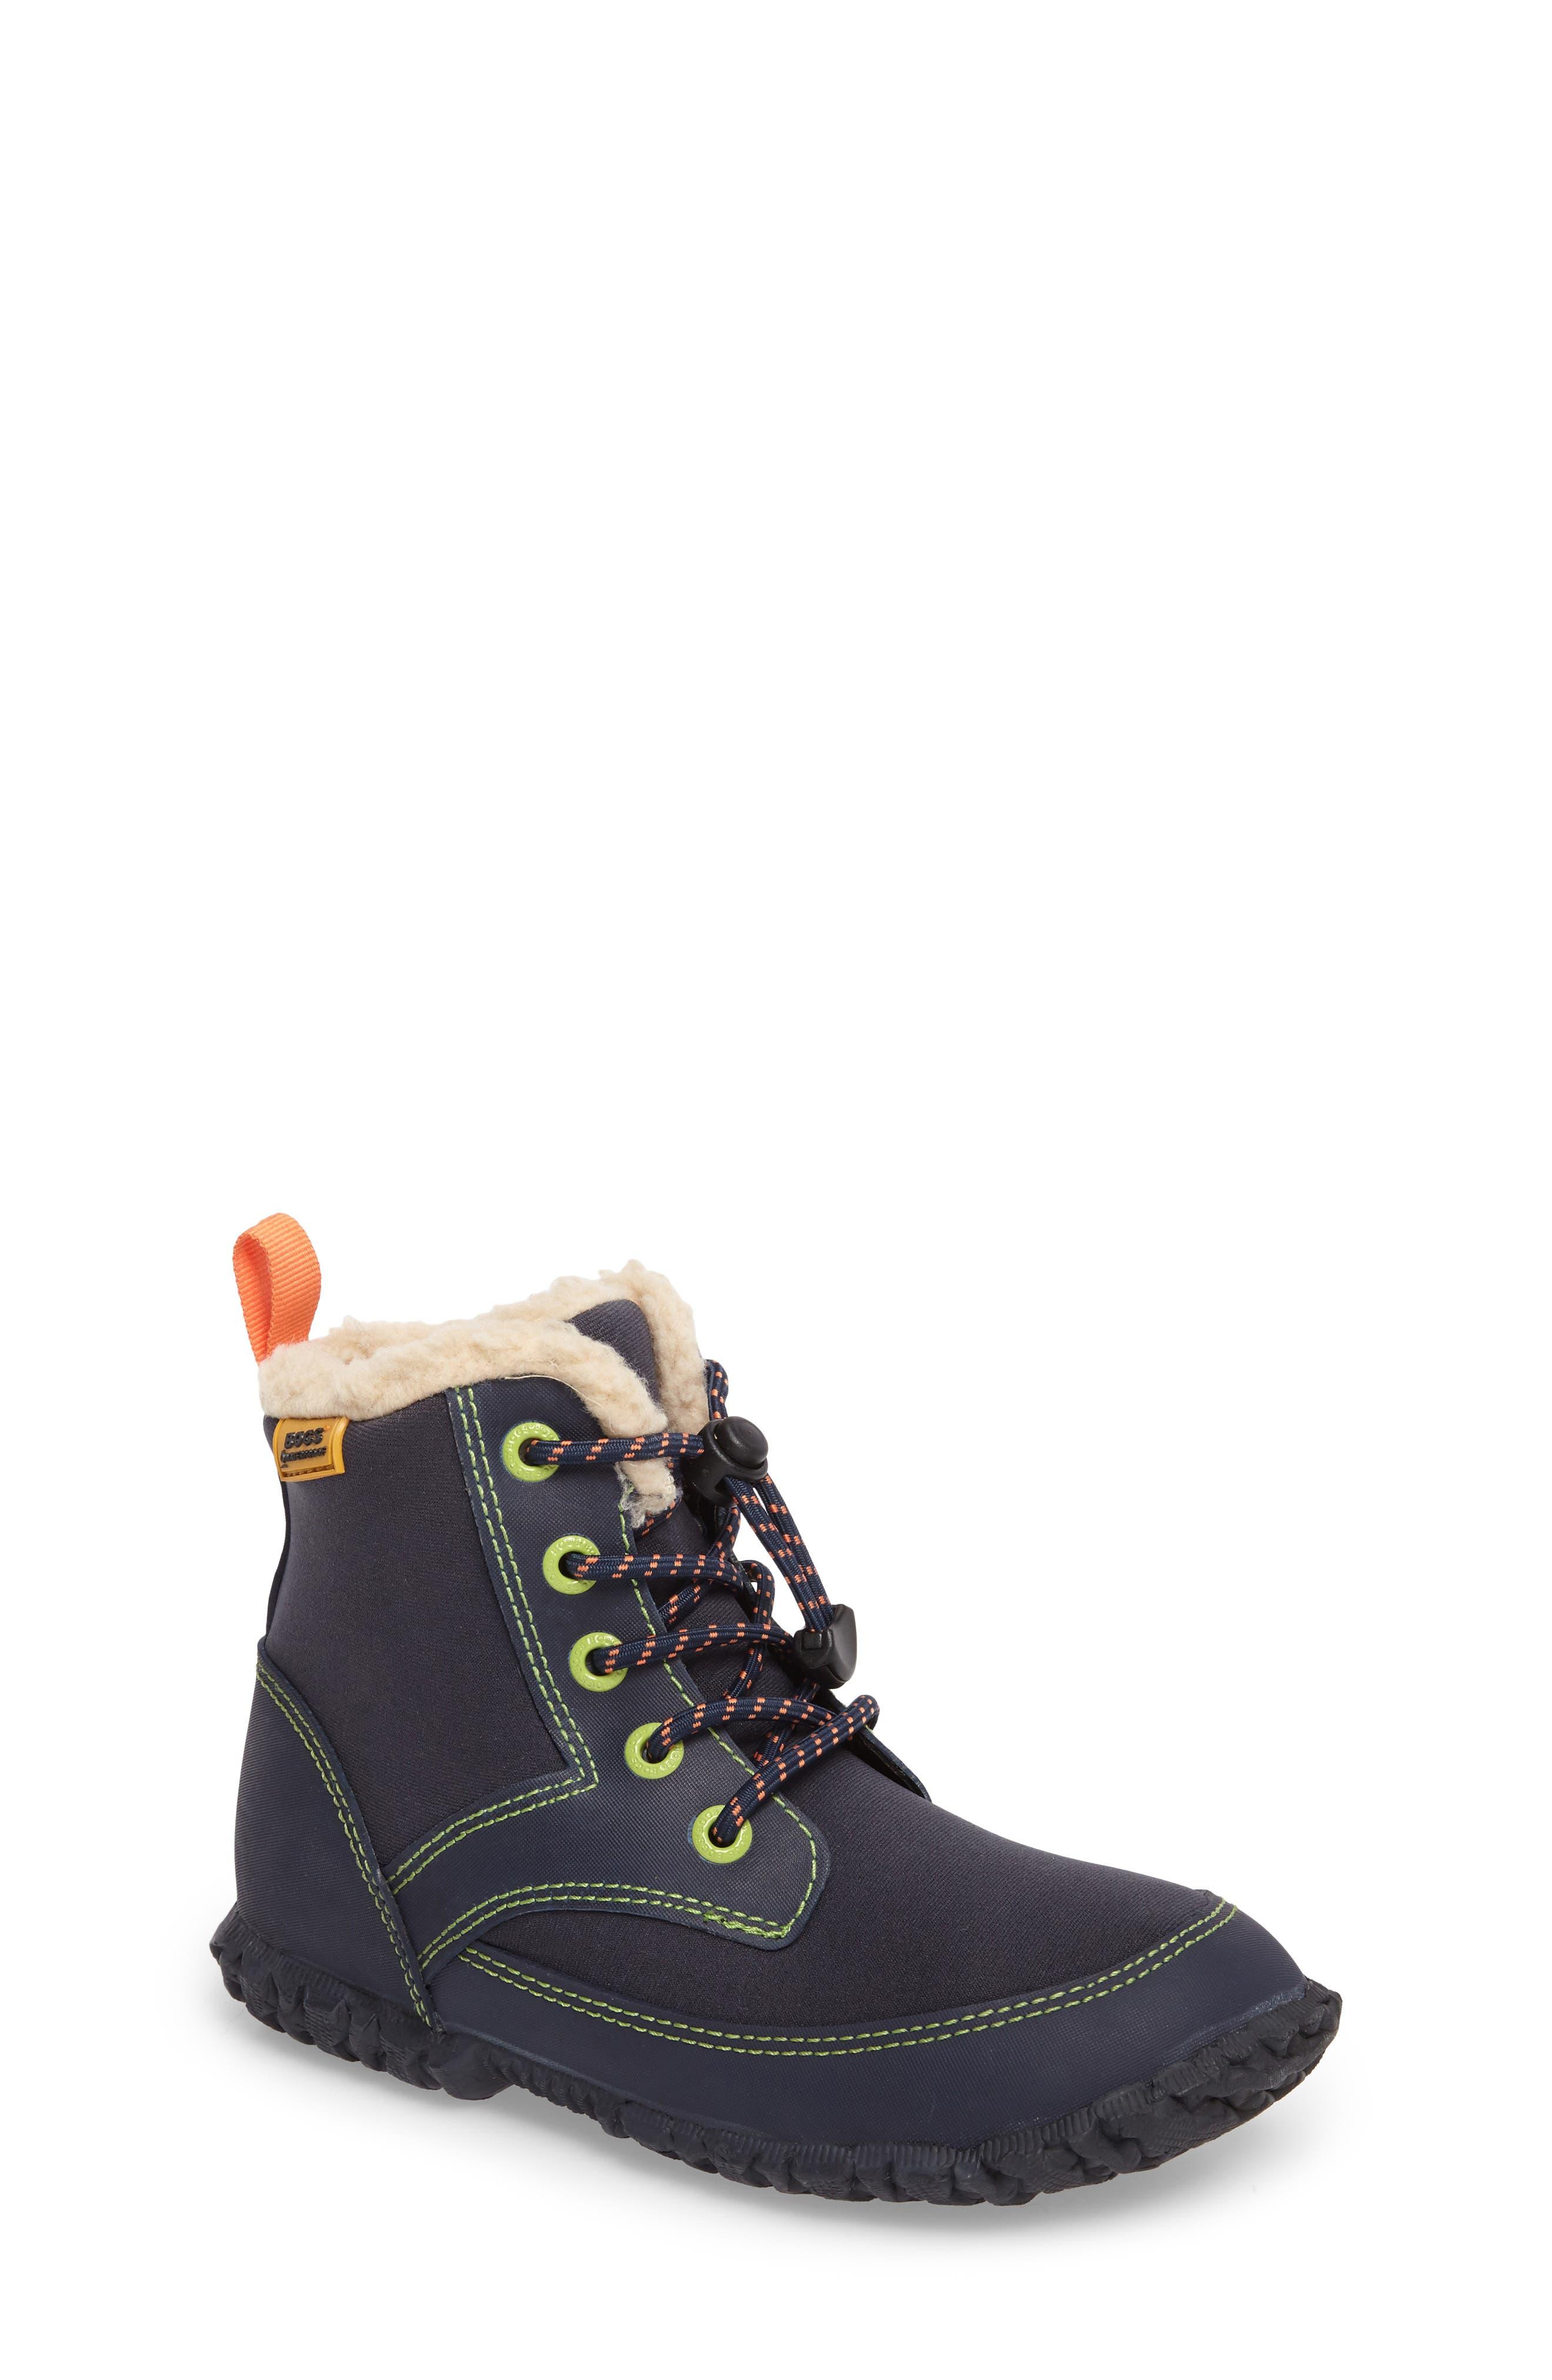 Skyler Faux Fur Insulated Waterproof Boot,                         Main,                         color, Dark Blue Multi